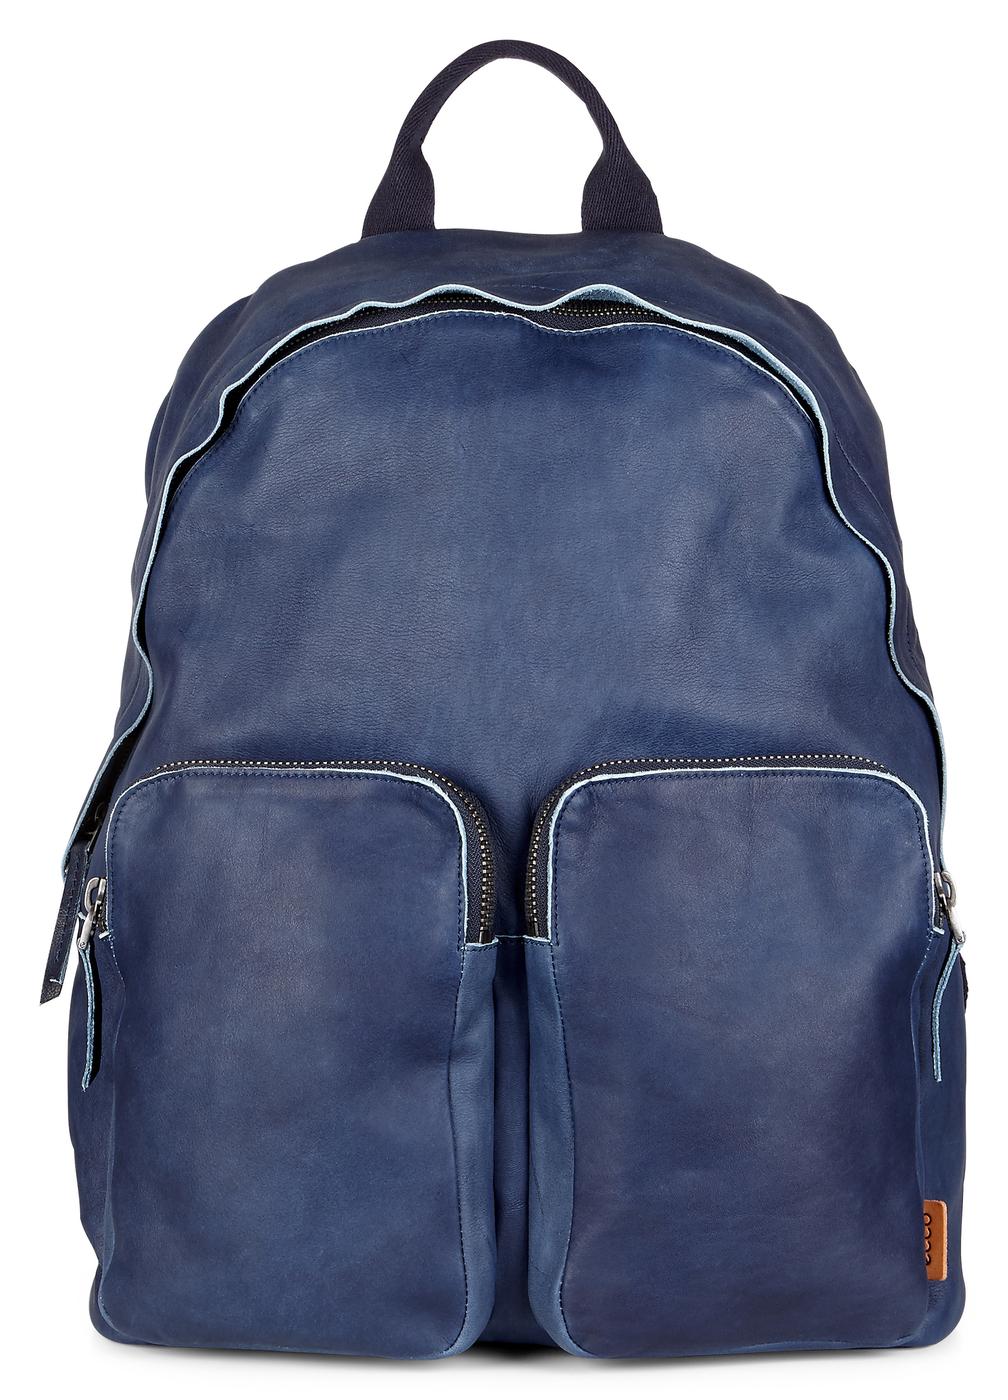 ECCO CASPER Backpack indigo